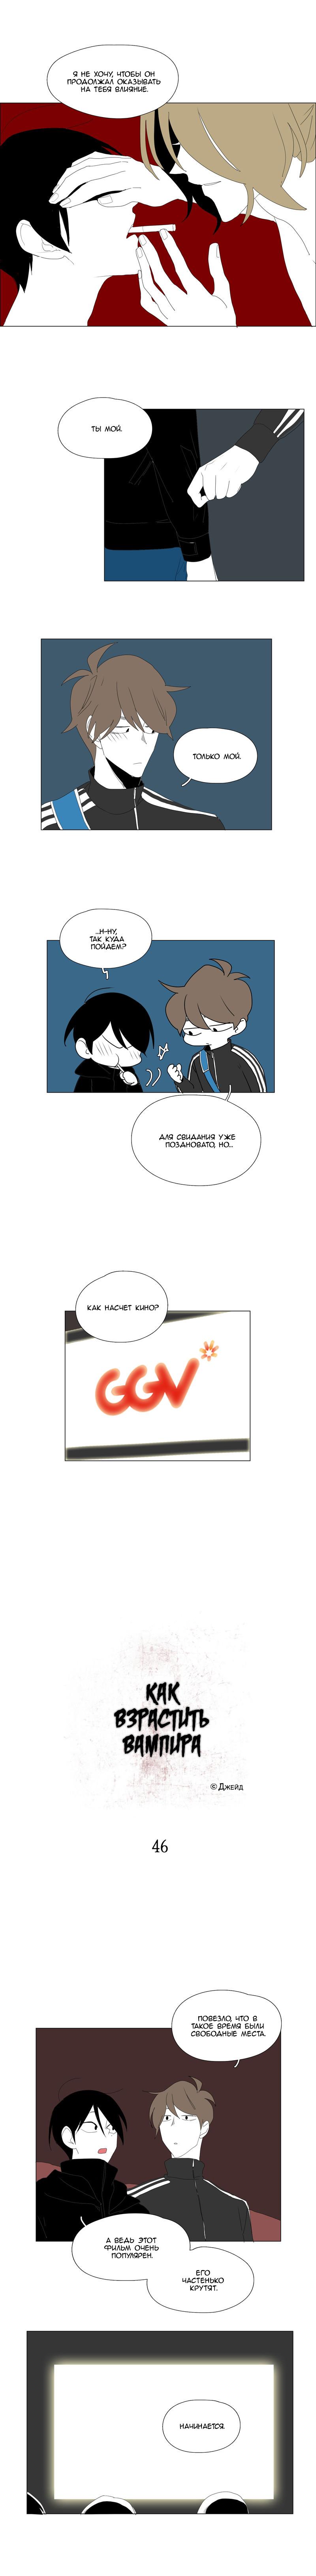 https://r1.ninemanga.com/comics/pic2/33/27873/316653/1484809886968.jpg Page 3